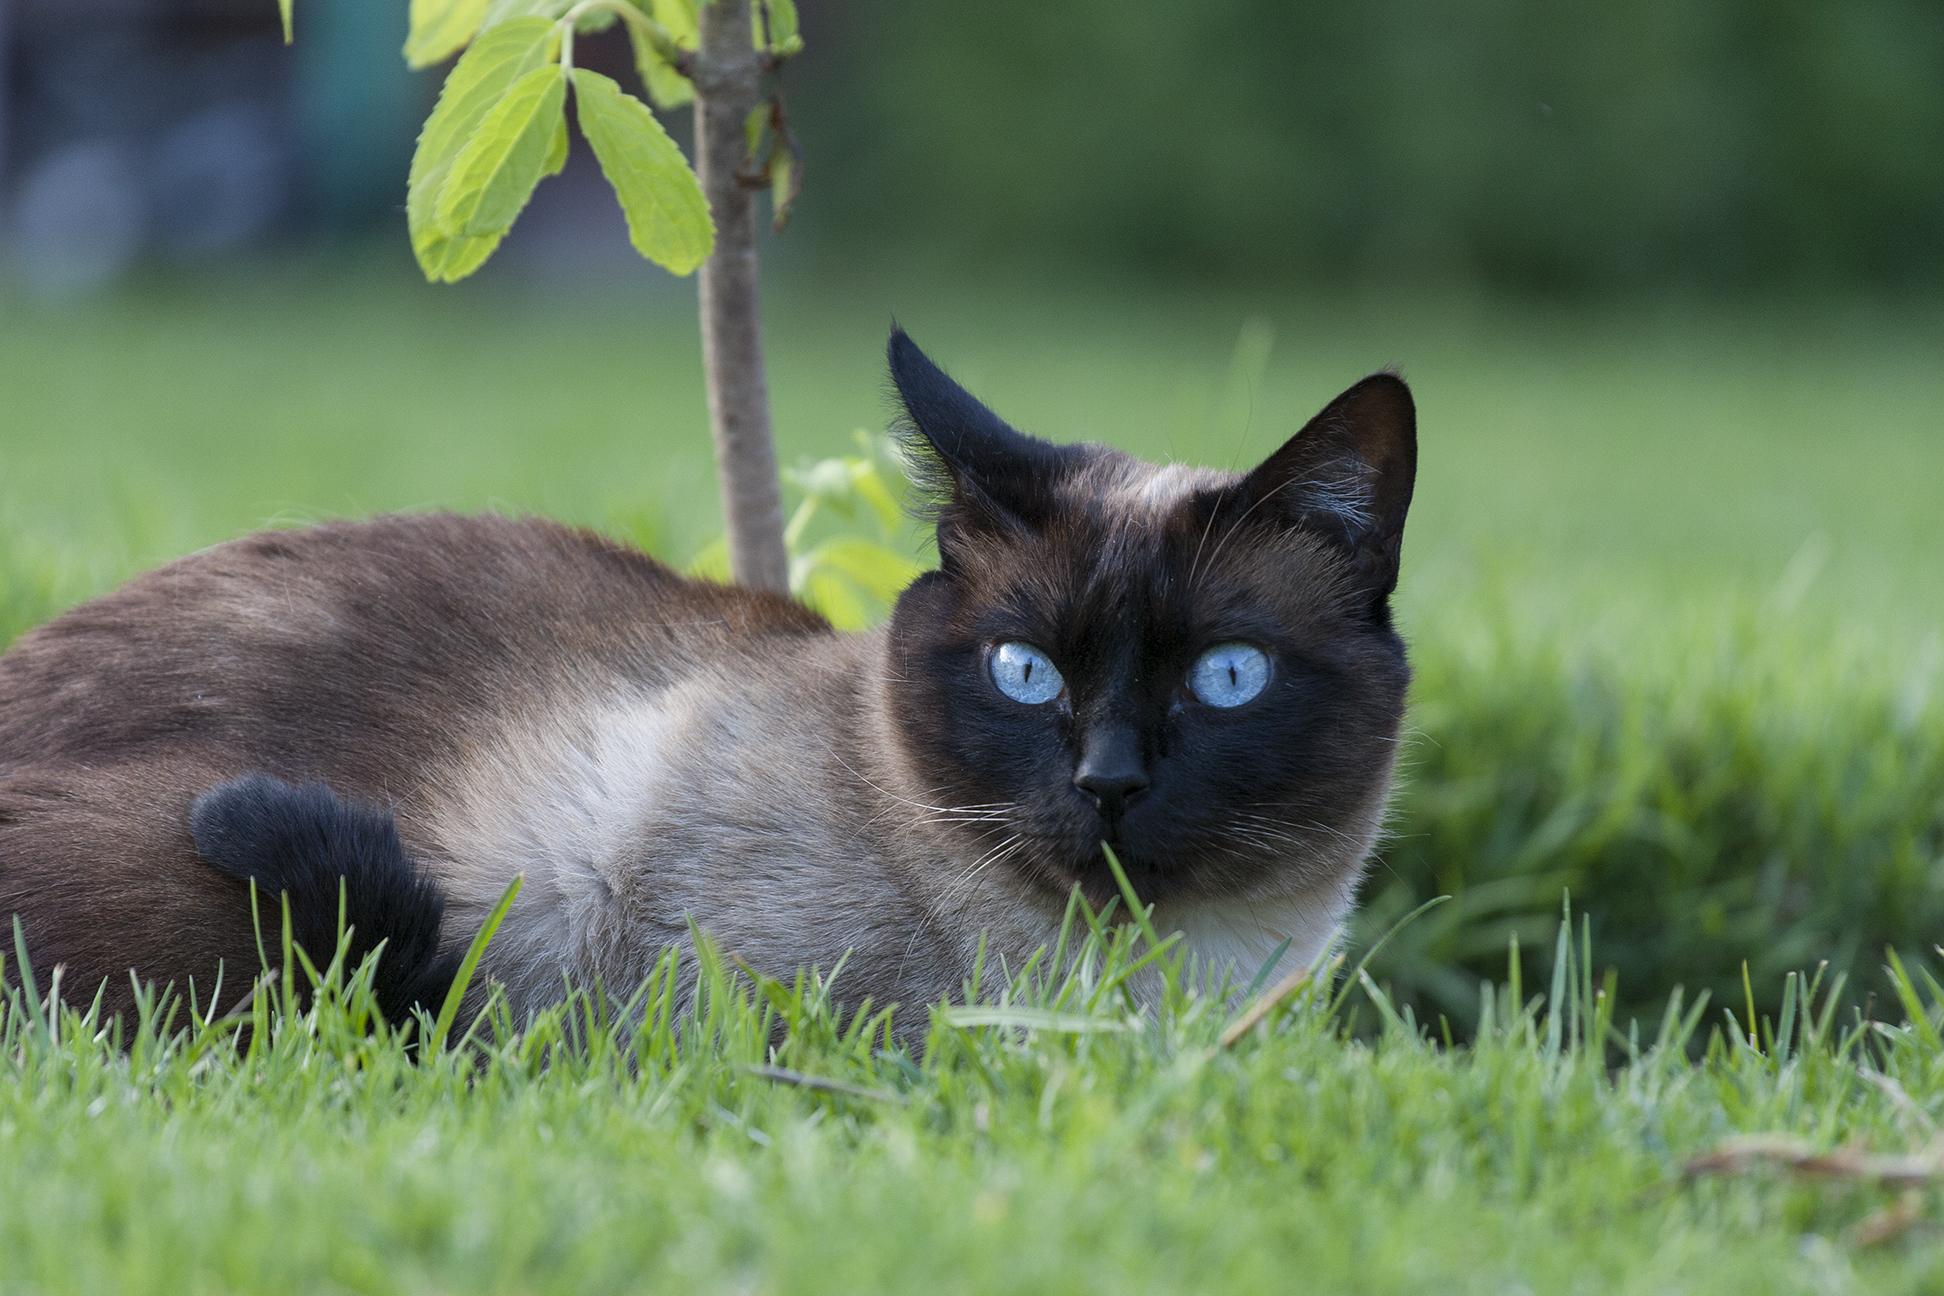 Tika, The Mysterious Medicine Woman Cat